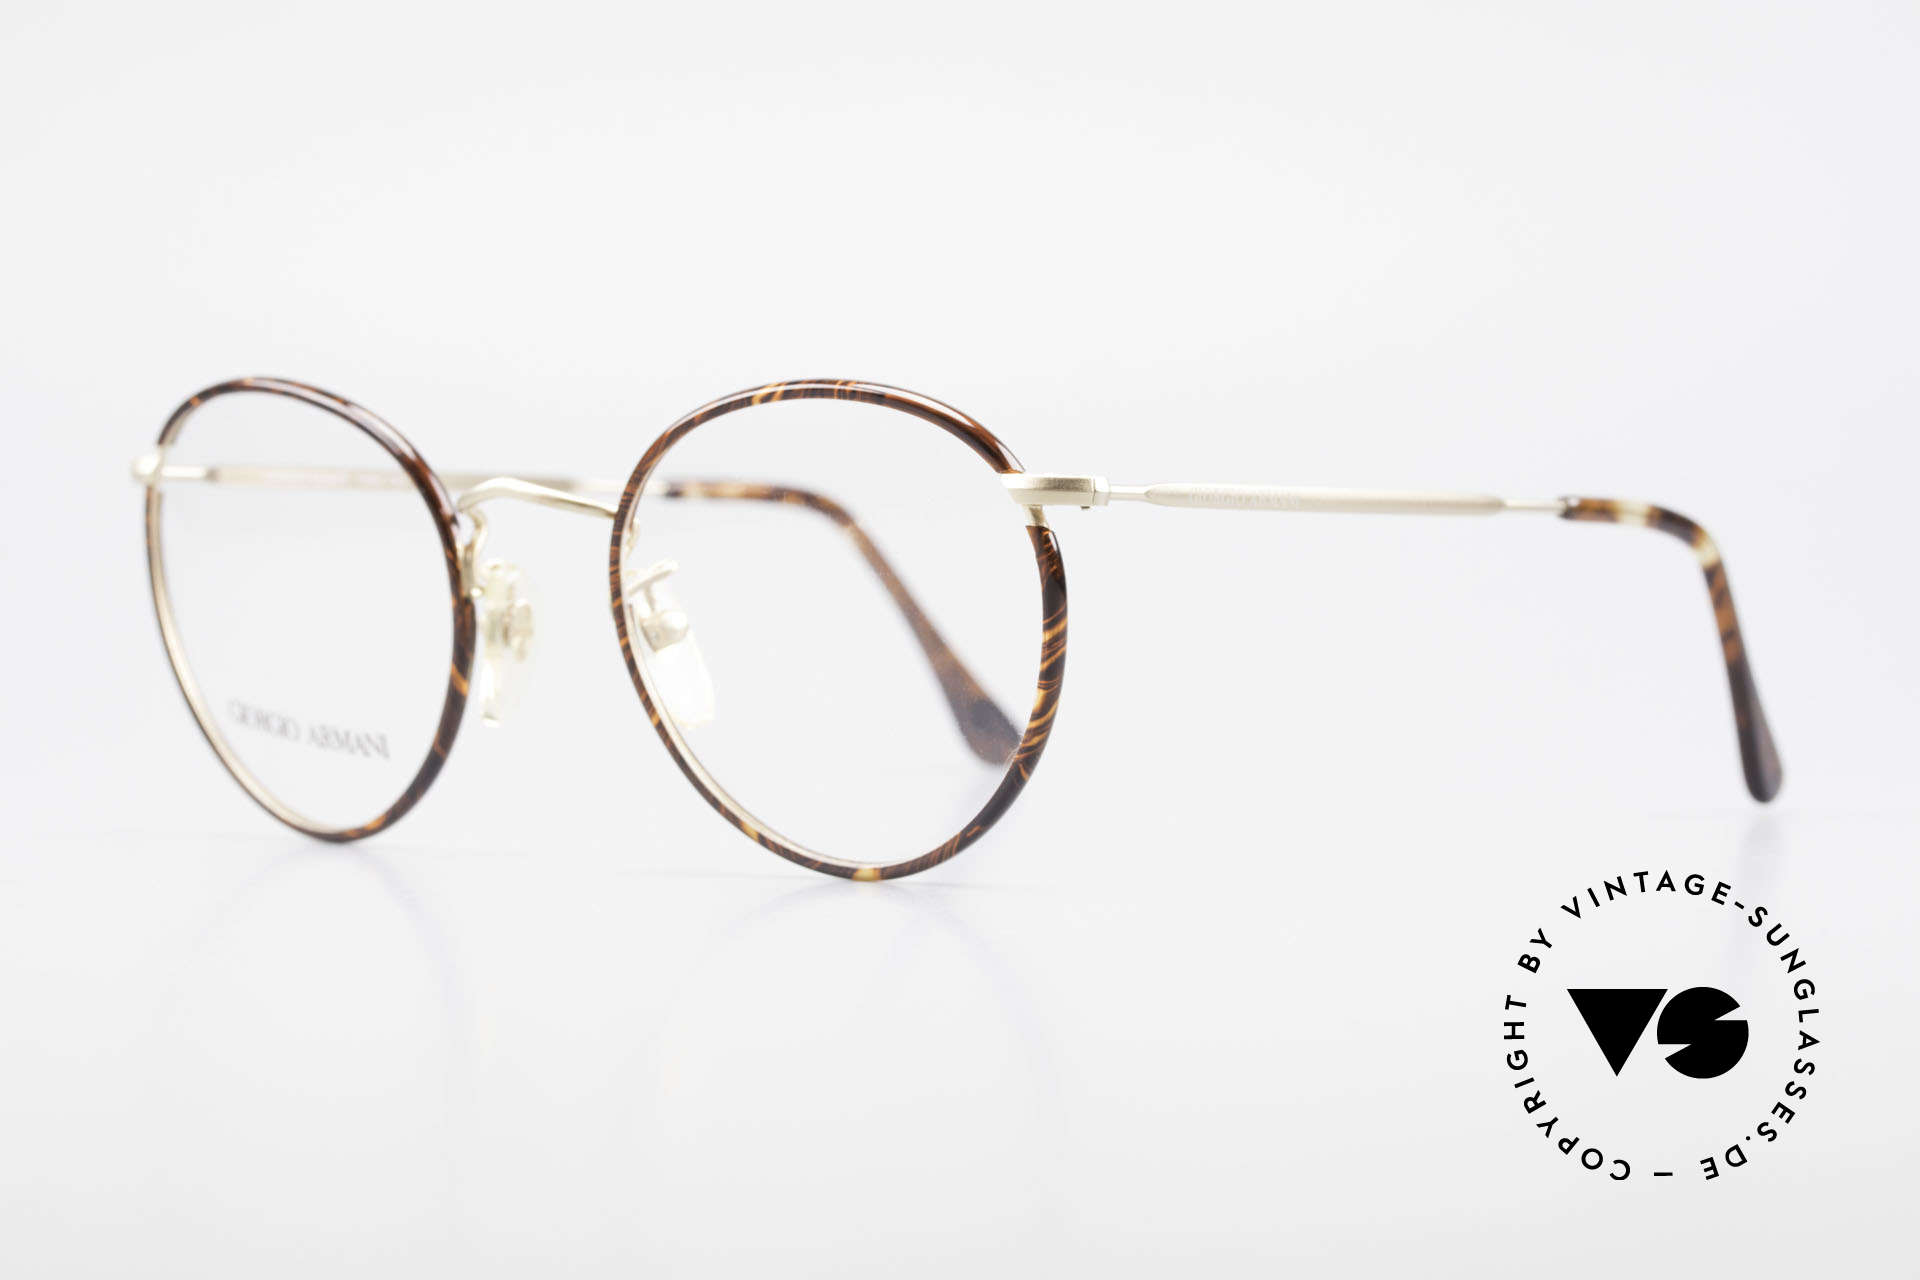 Giorgio Armani 112 90's Panto Eyeglasses Men, true 'gentlemen glasses' in tangible premium-quality, Made for Men